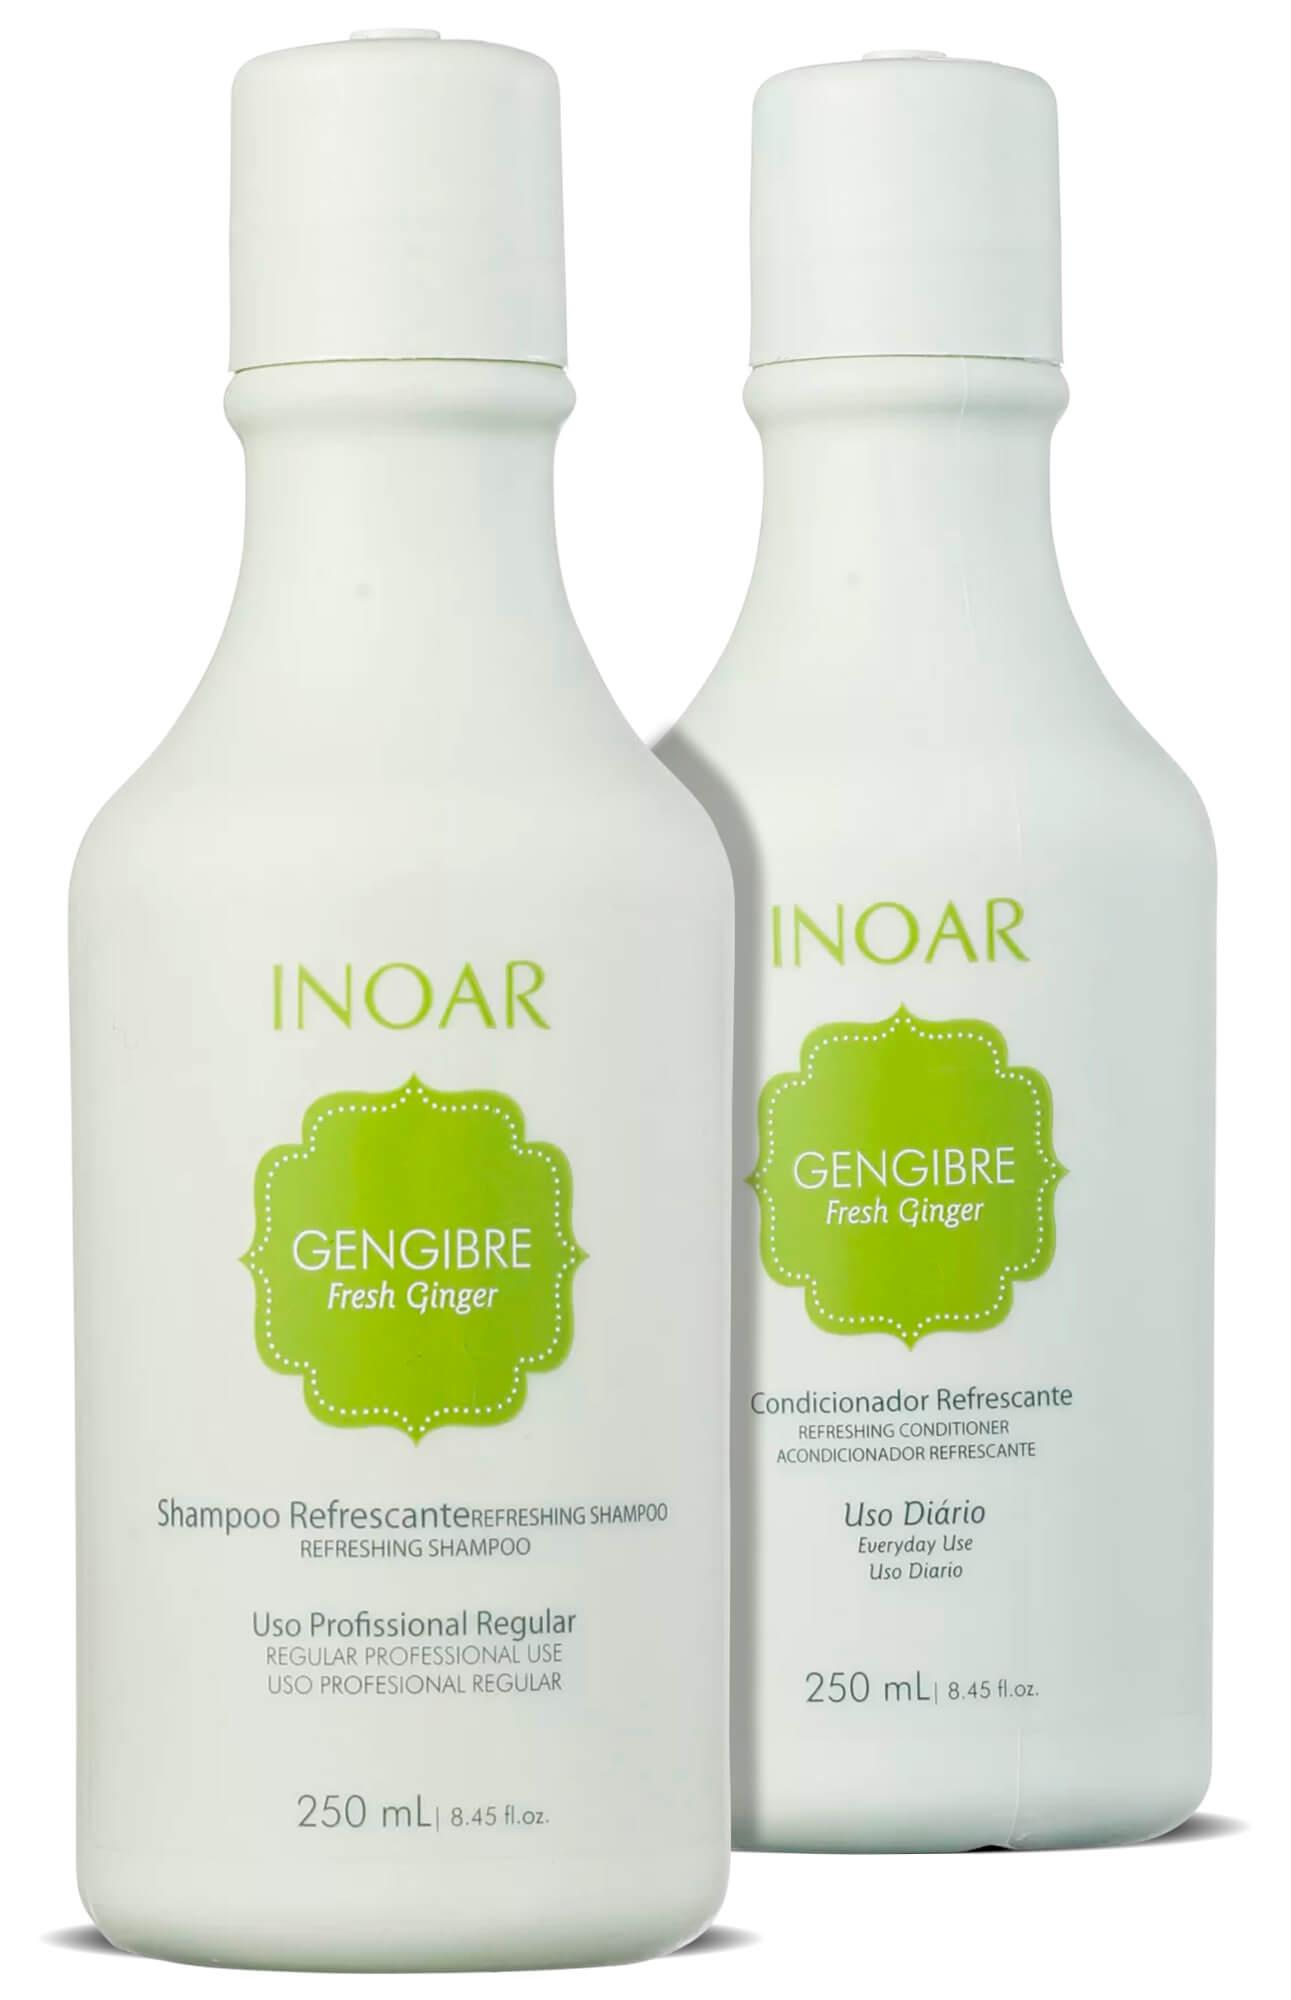 Kit Gengibre Fresh Ginger Shampoo + Condicionador 250ml